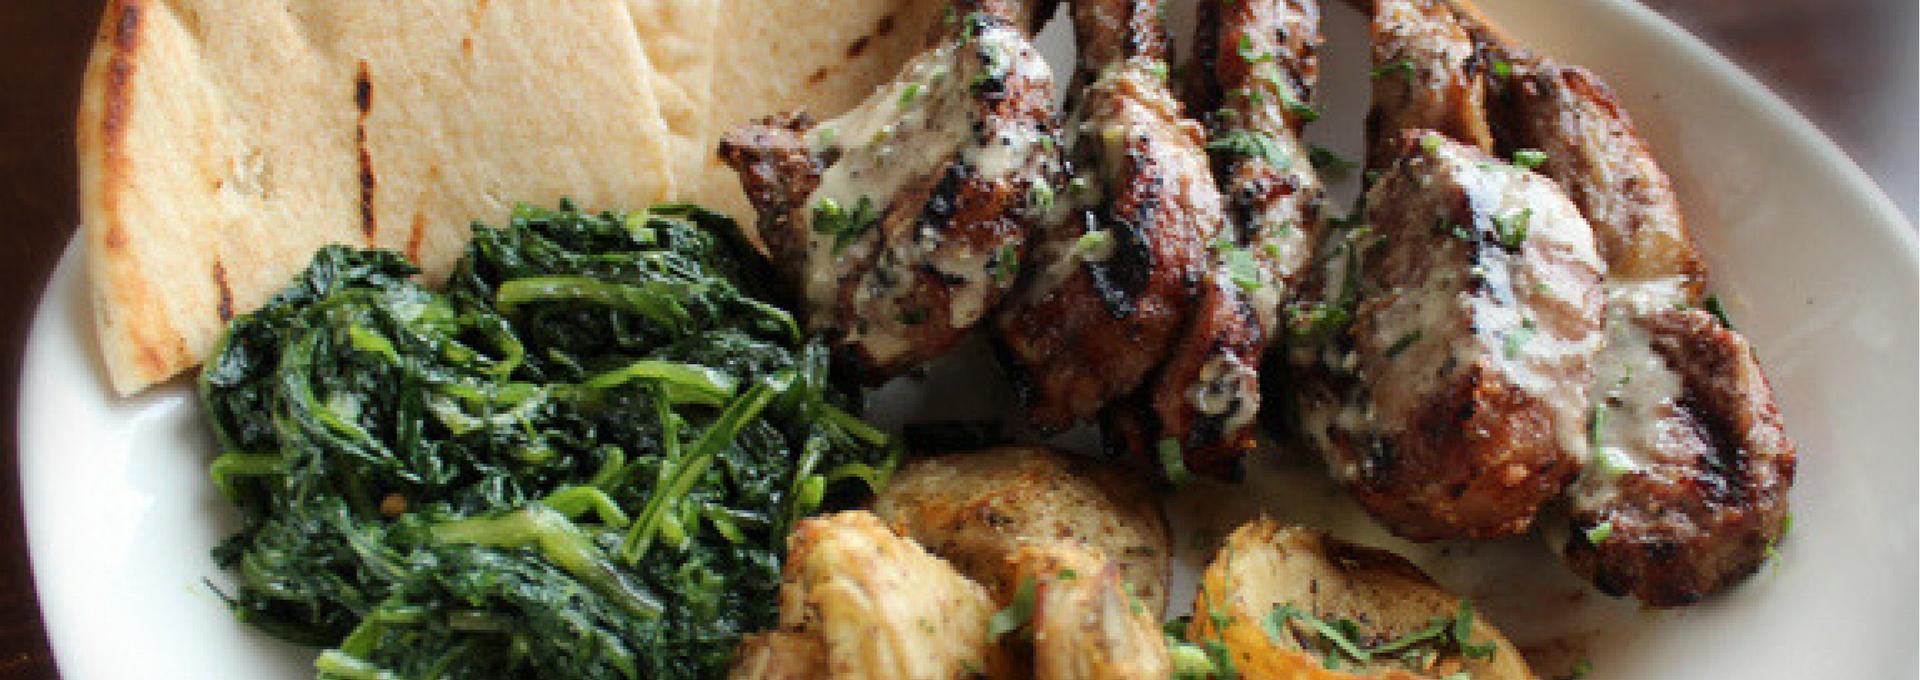 Bg hidpi olive pit grill